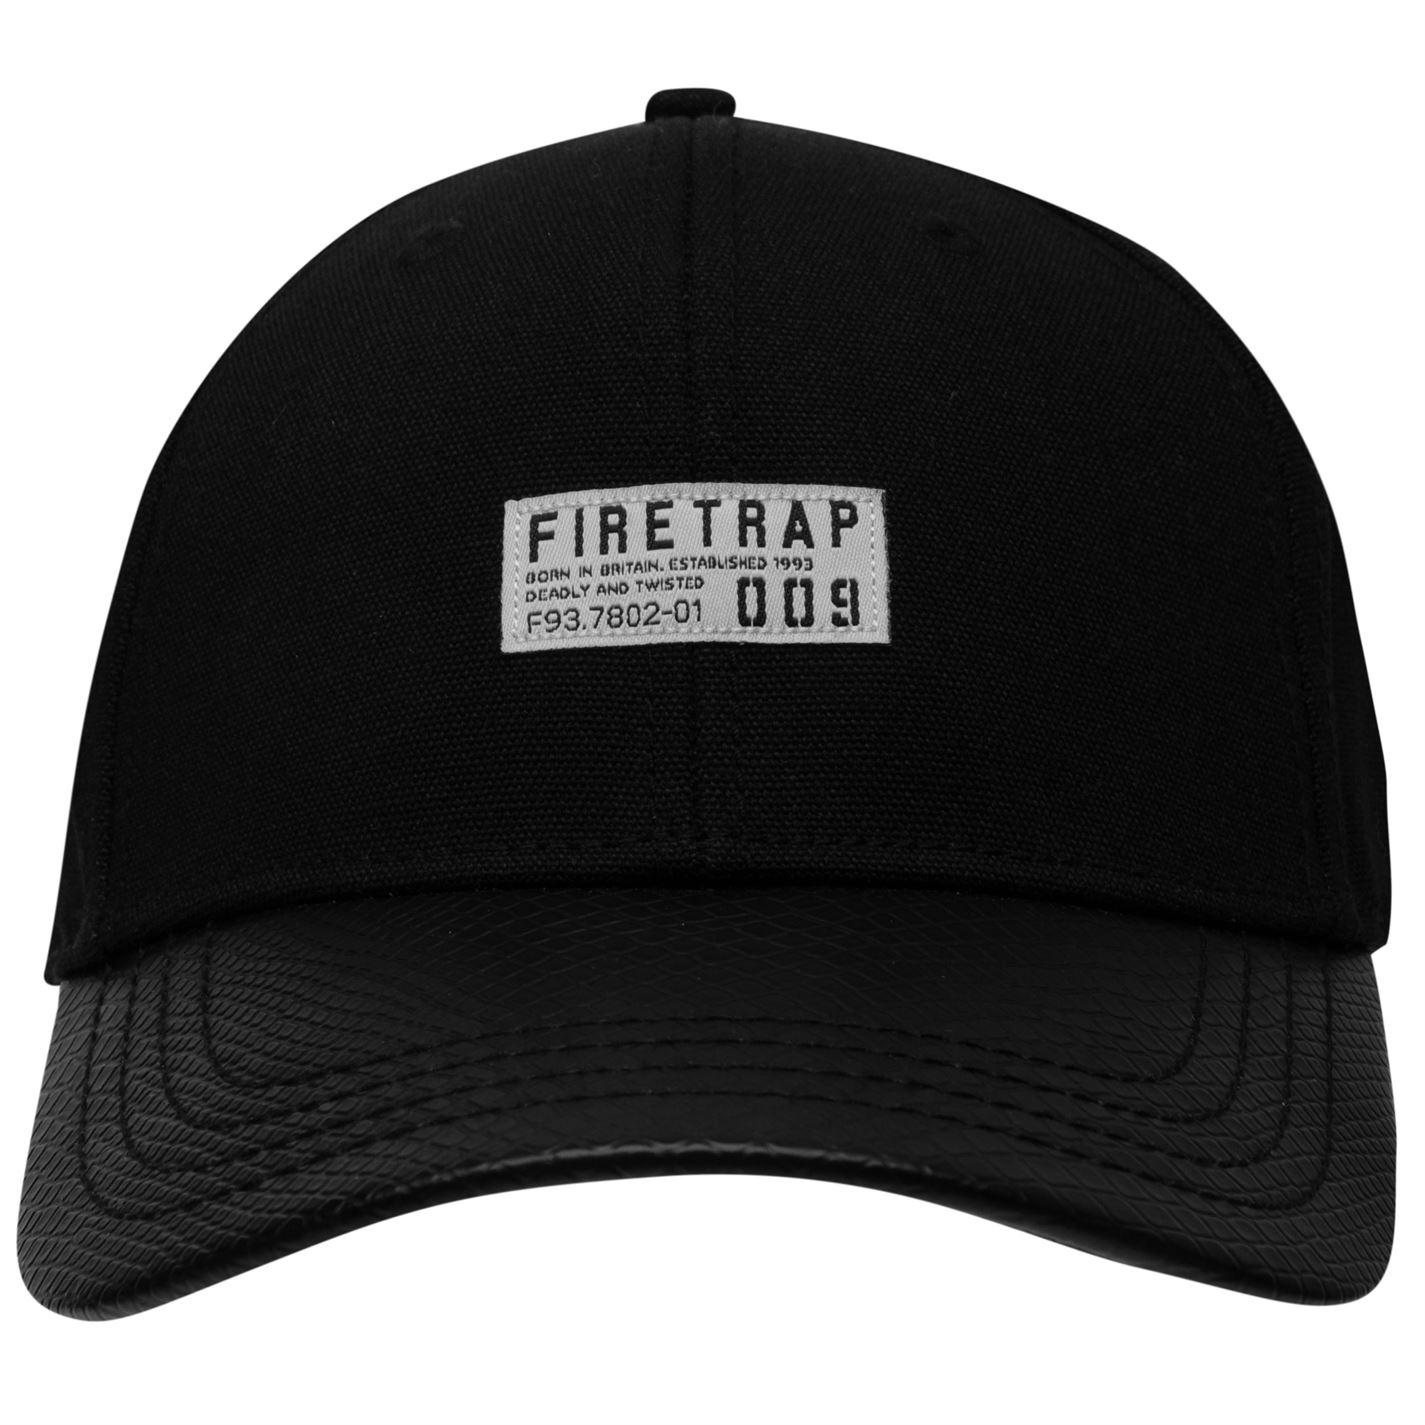 Mens Firetrap Lightweight Stylish Premium Cap Headwear